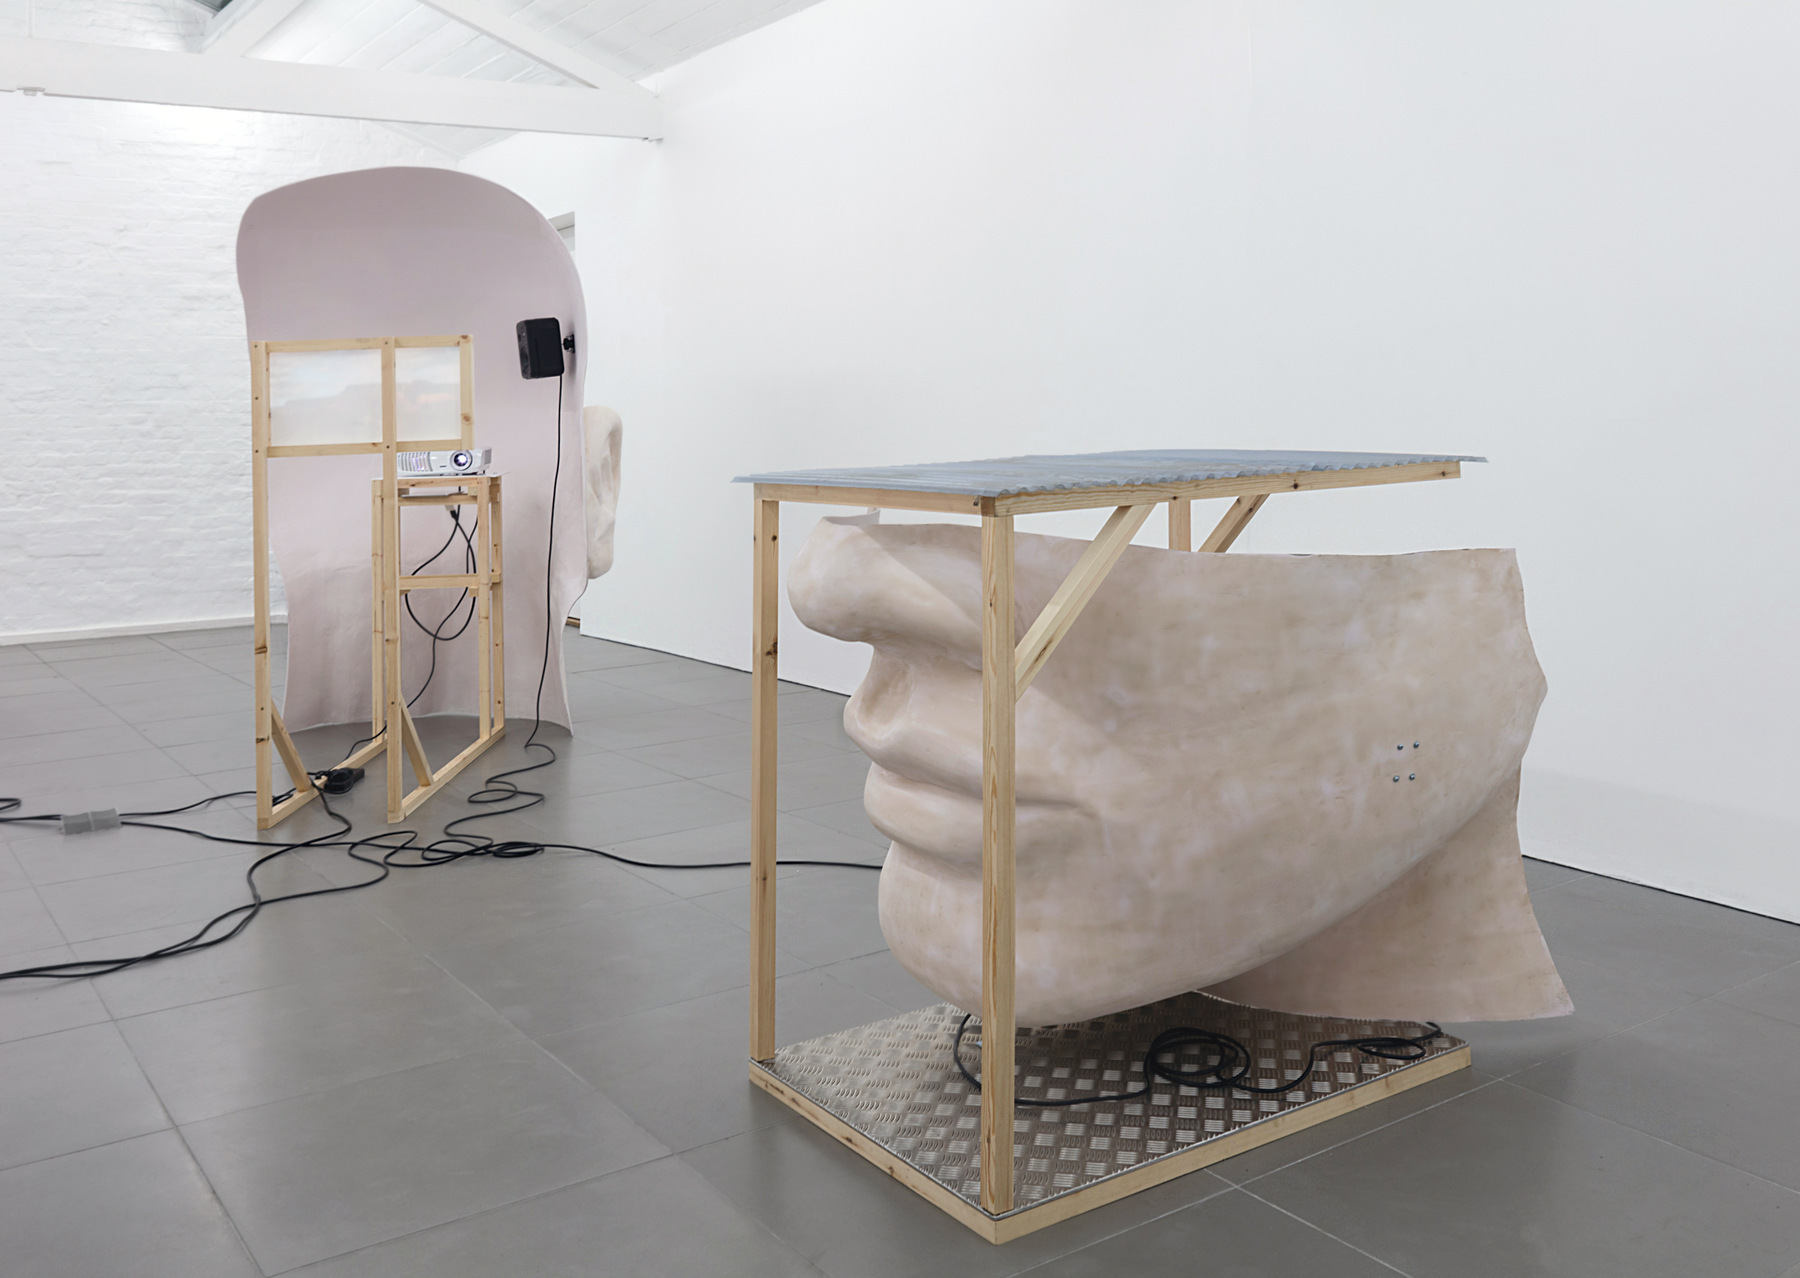 10. Anne de Vries, SUBMISSION 2015, wood, metal, fibreglass resin, audio, video